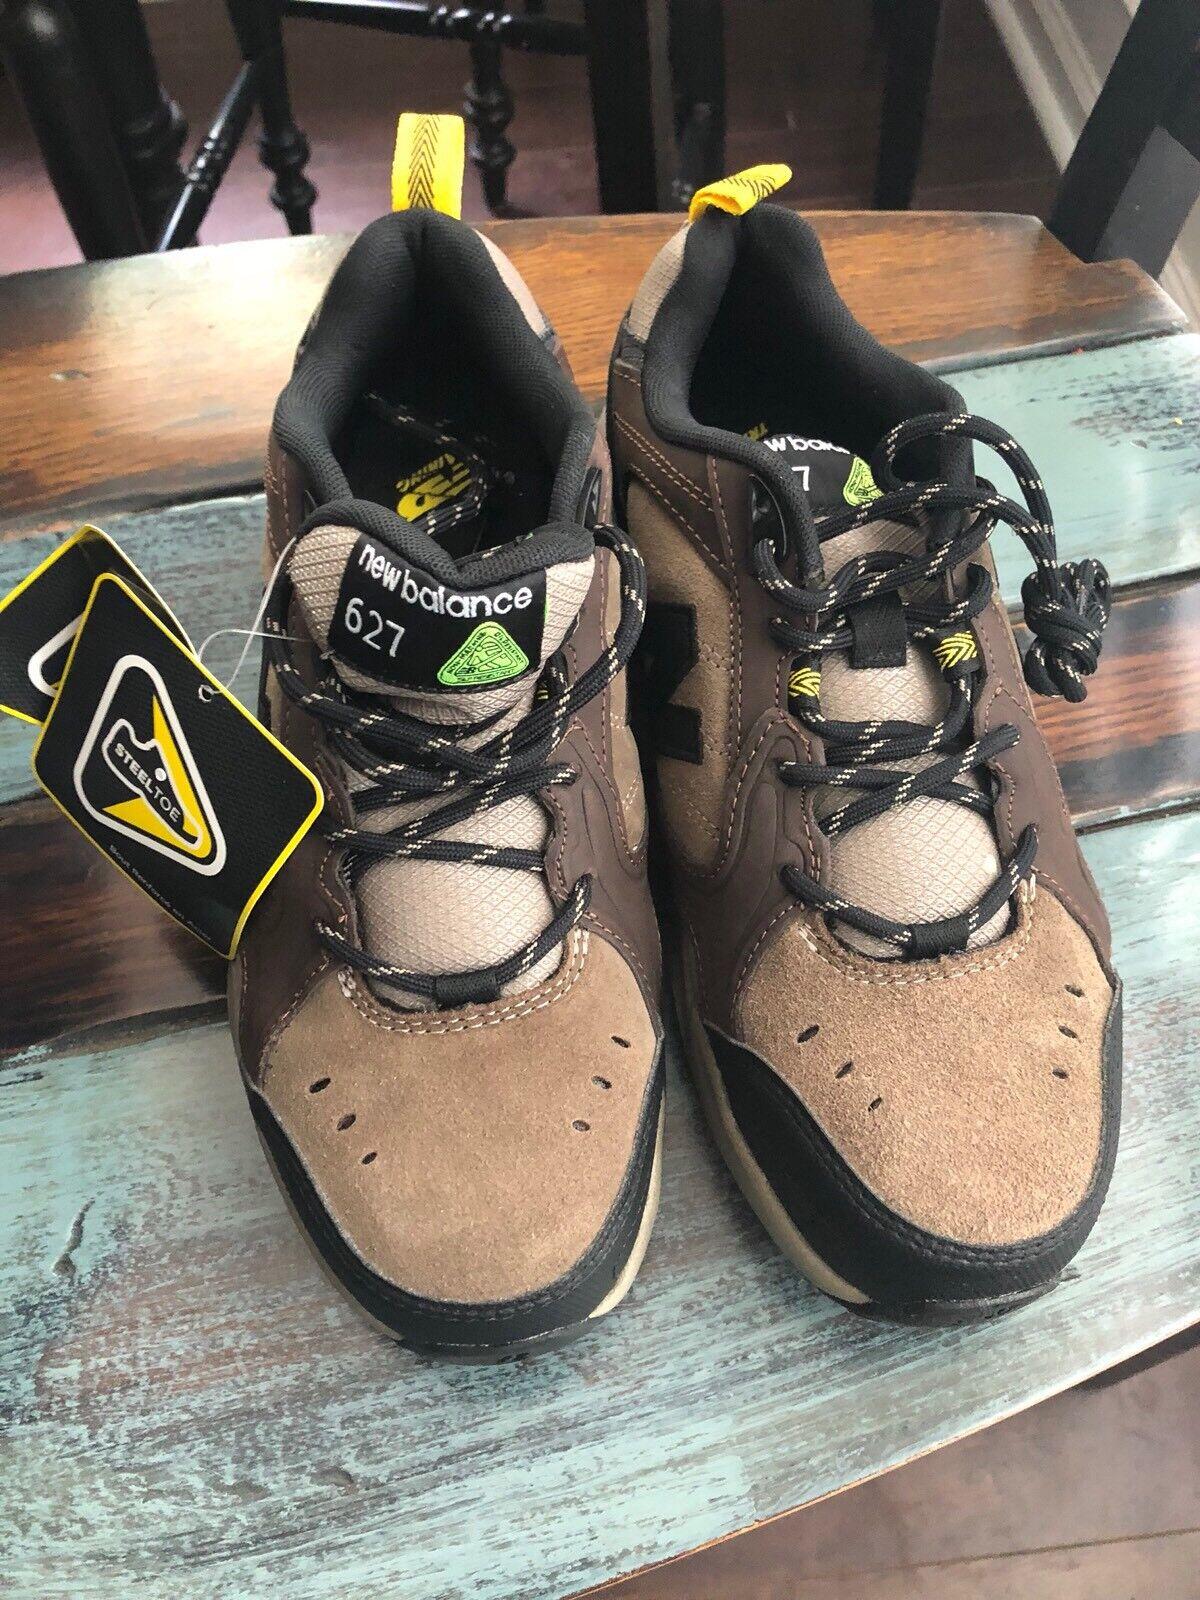 Scarpe casual da uomo New Balance MID6270 Steel Toe Slip Resistant Suede Brown Work Shoe uomo Size 7